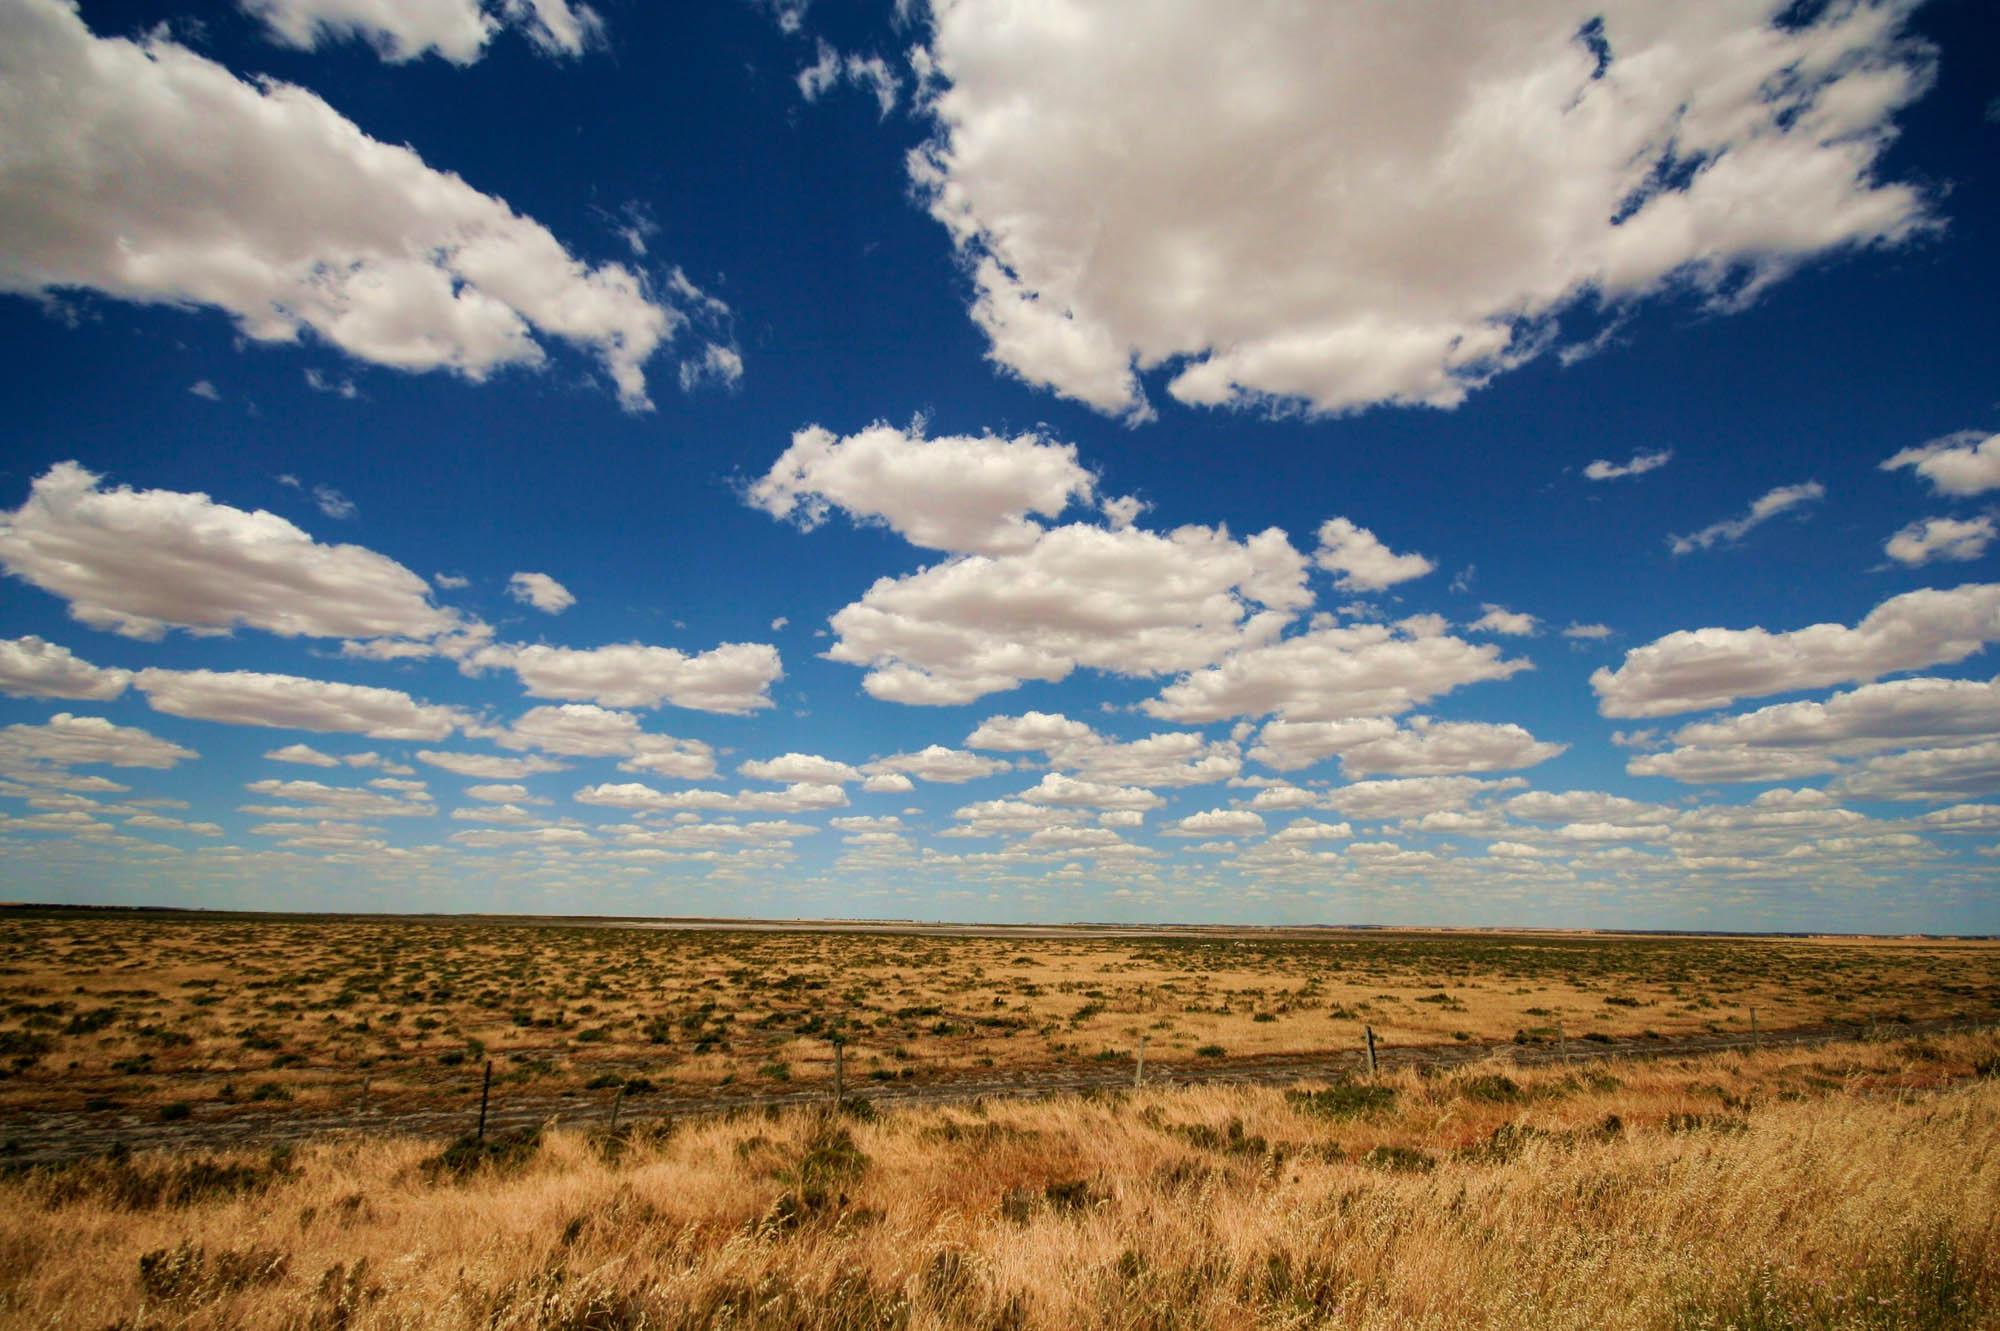 Cloud formations in the Australian wilderness